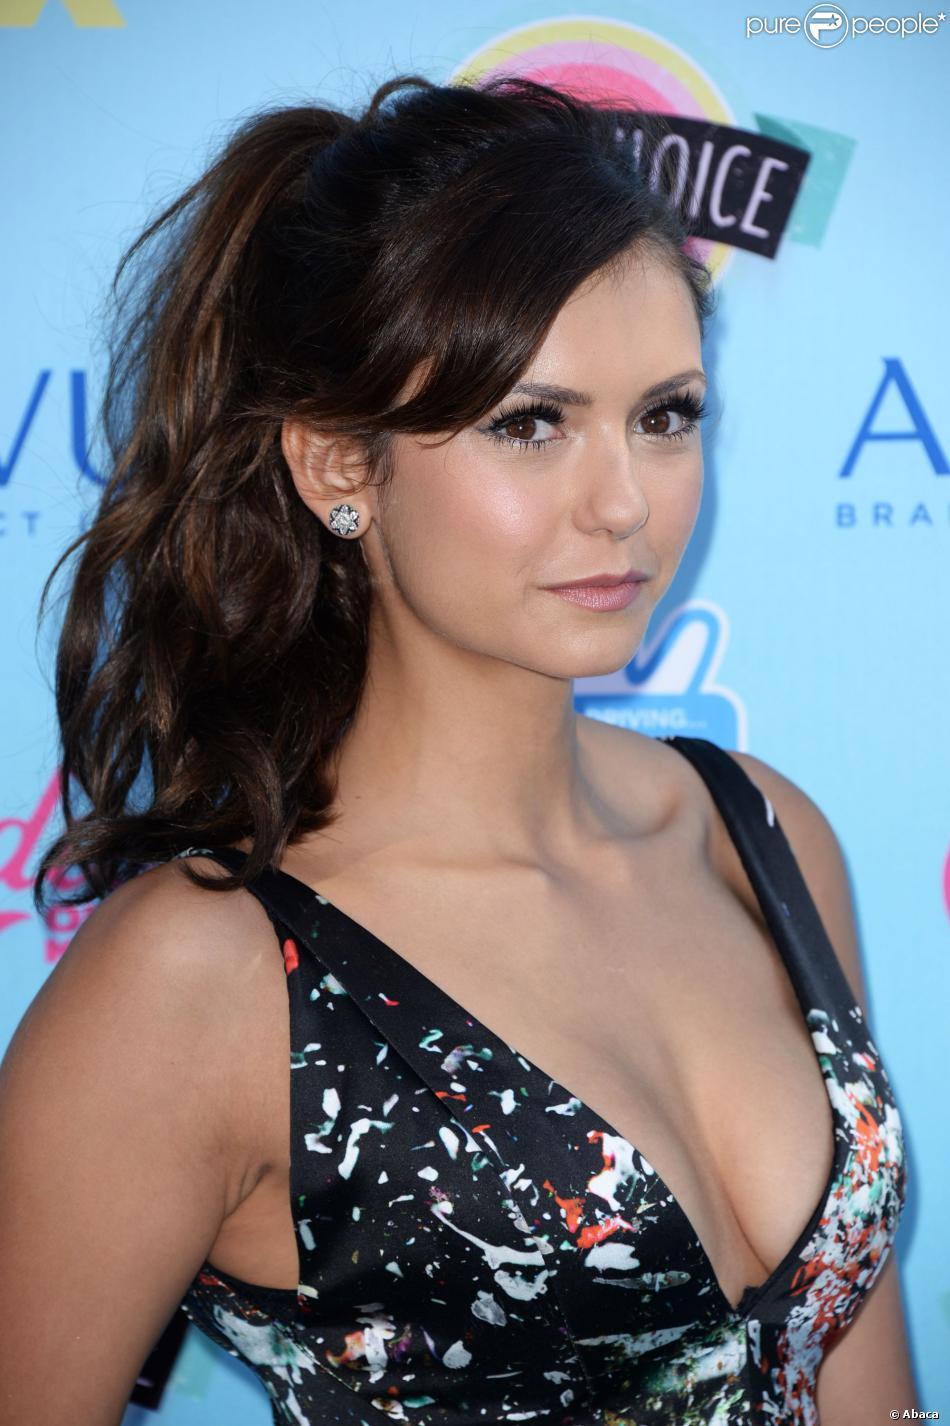 Nina Dobrev lors des Teen Choice Awards en août 2013 à Los Angeles